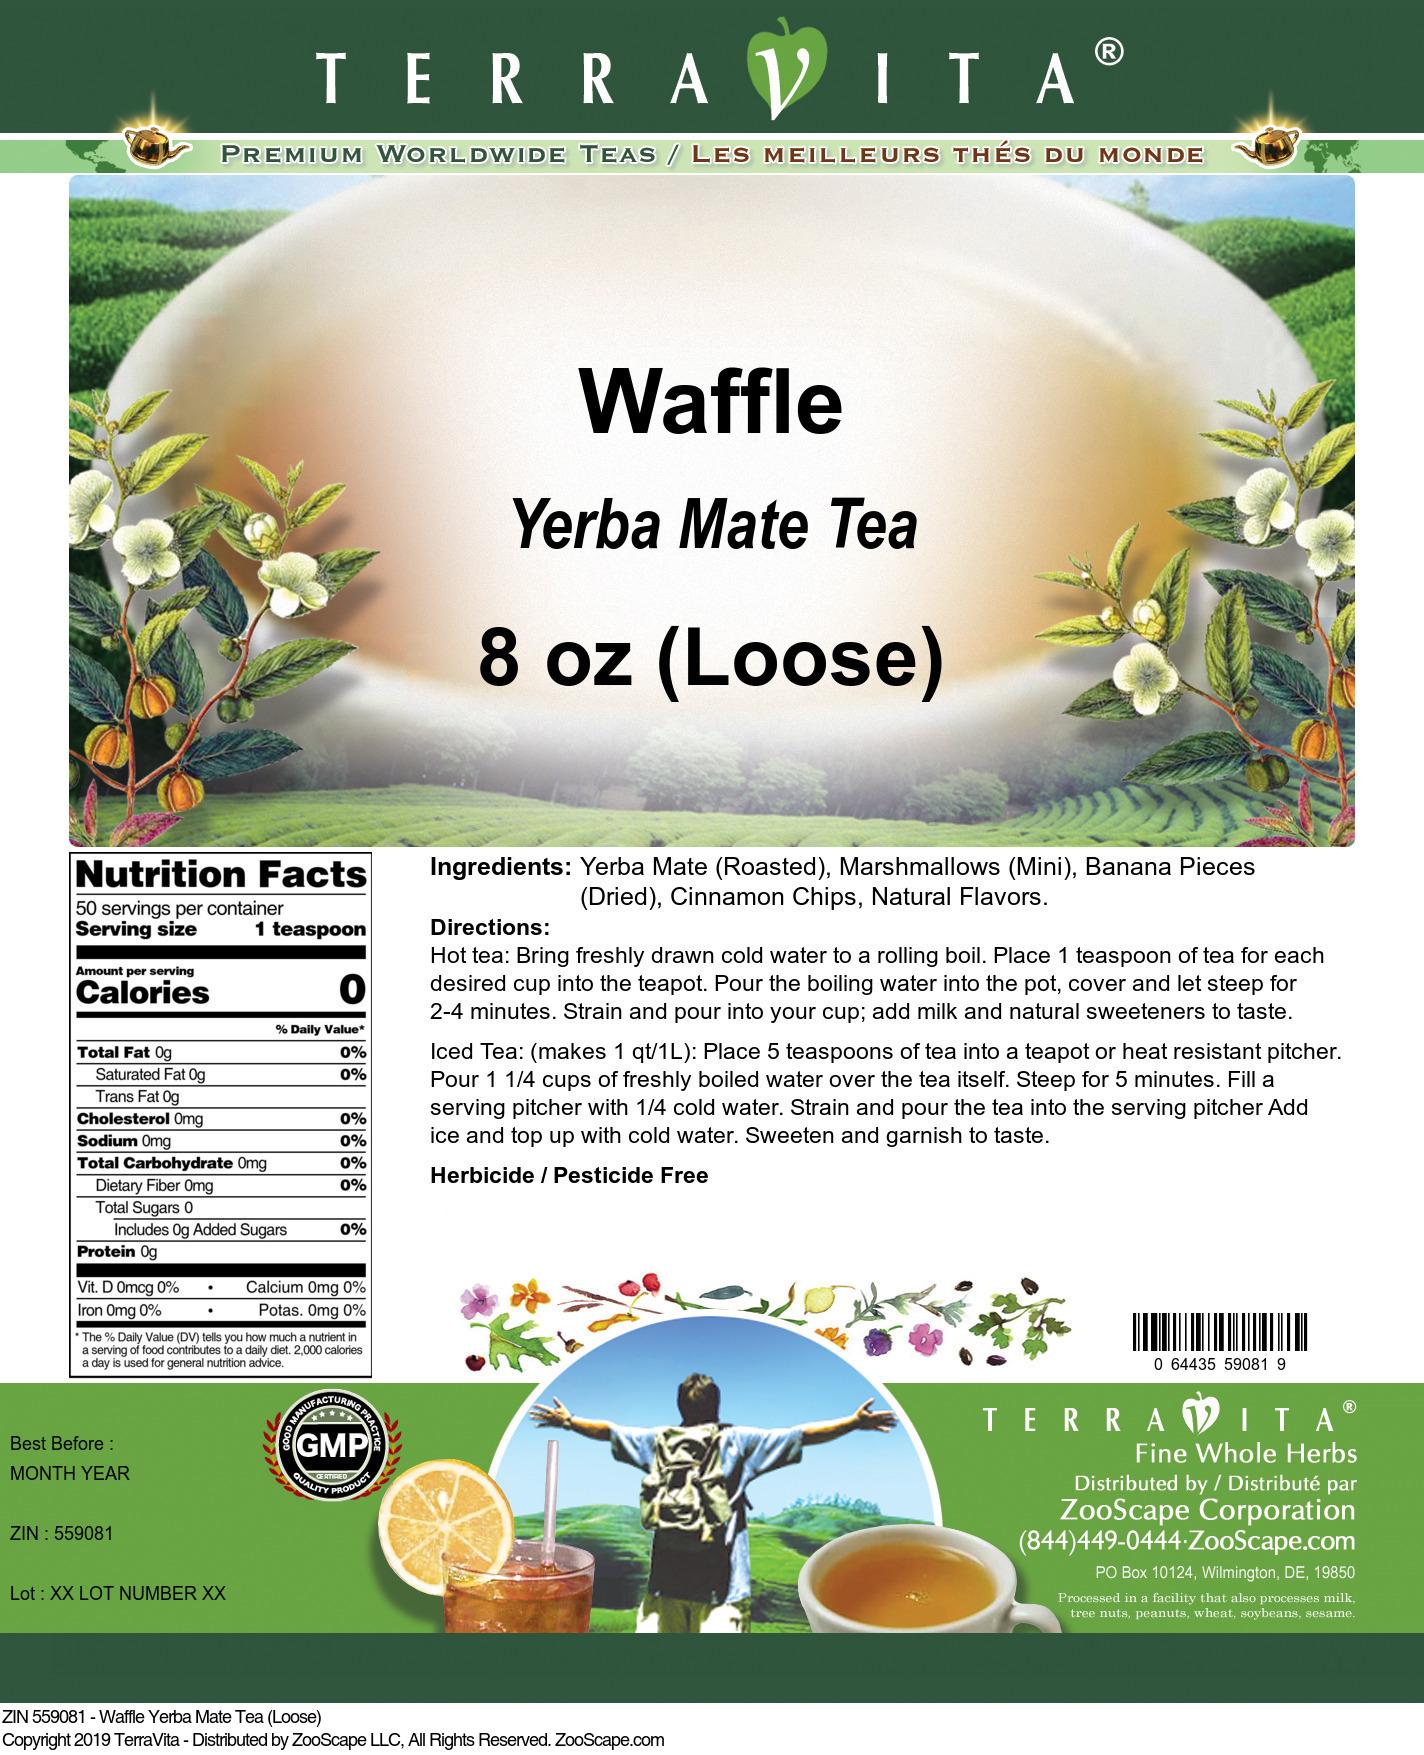 Waffle Yerba Mate Tea (Loose)